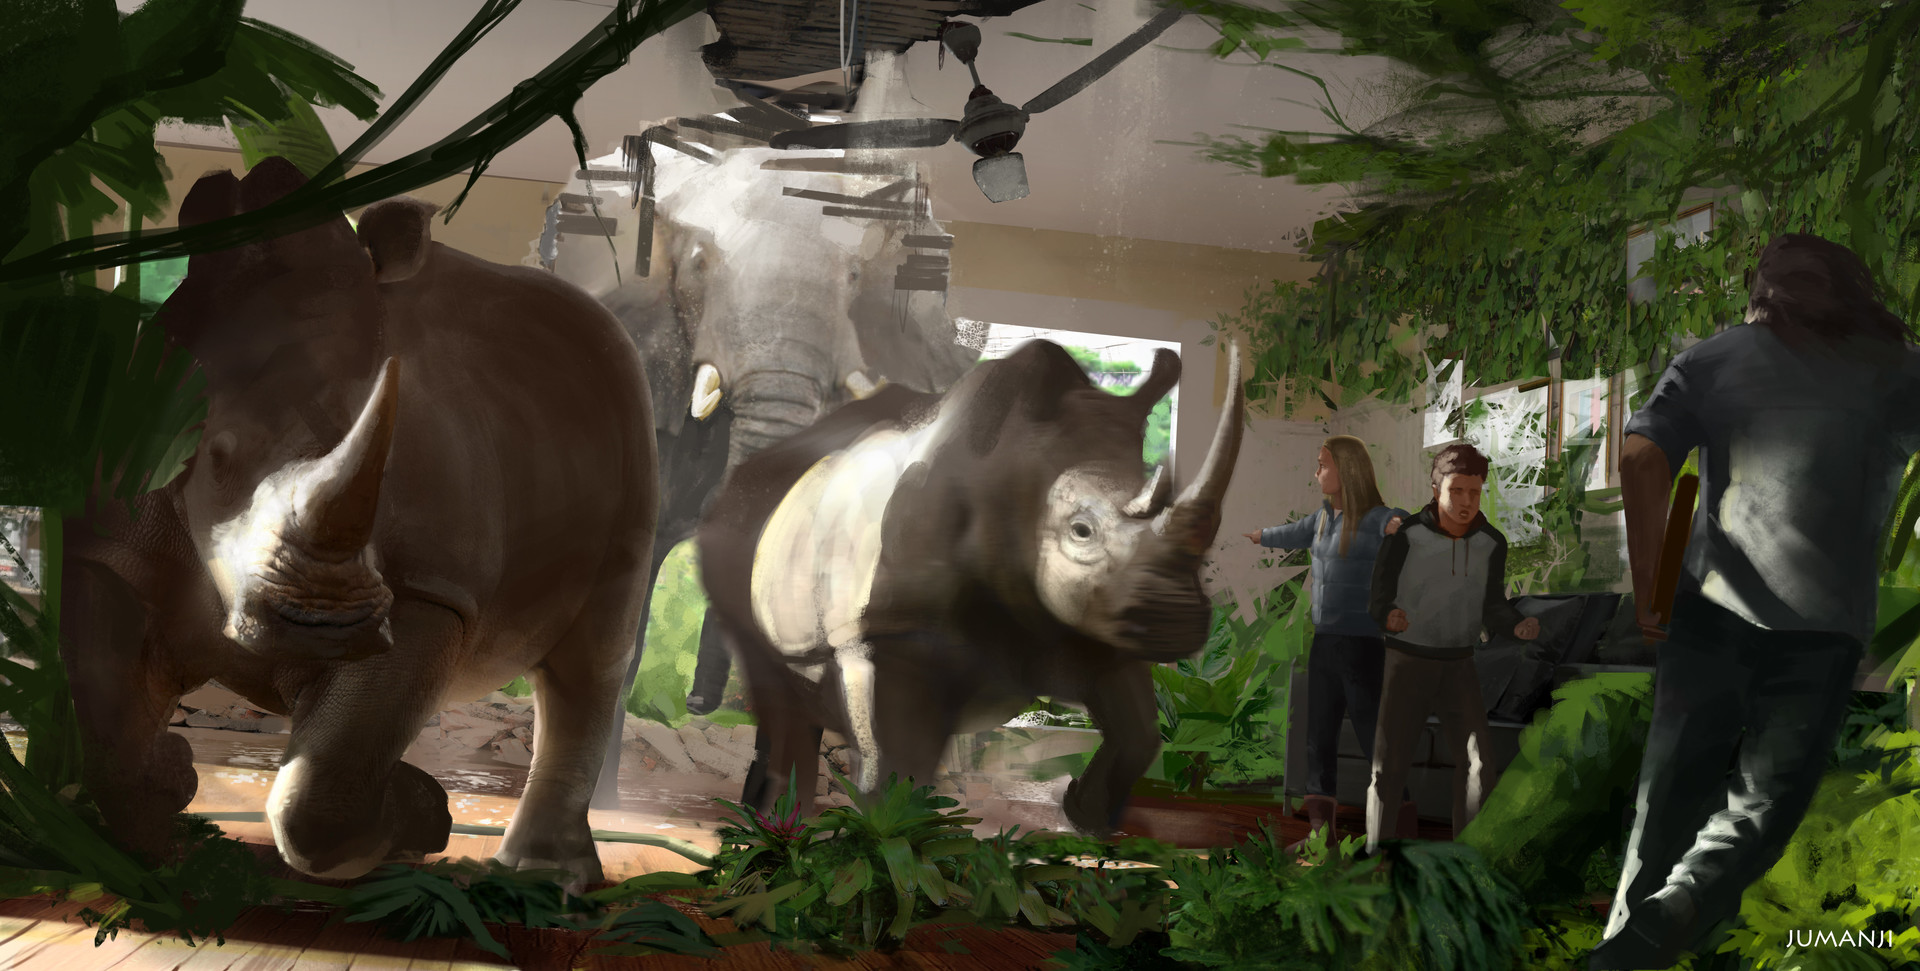 Fat hippo and a small gorilla - 1 part 8